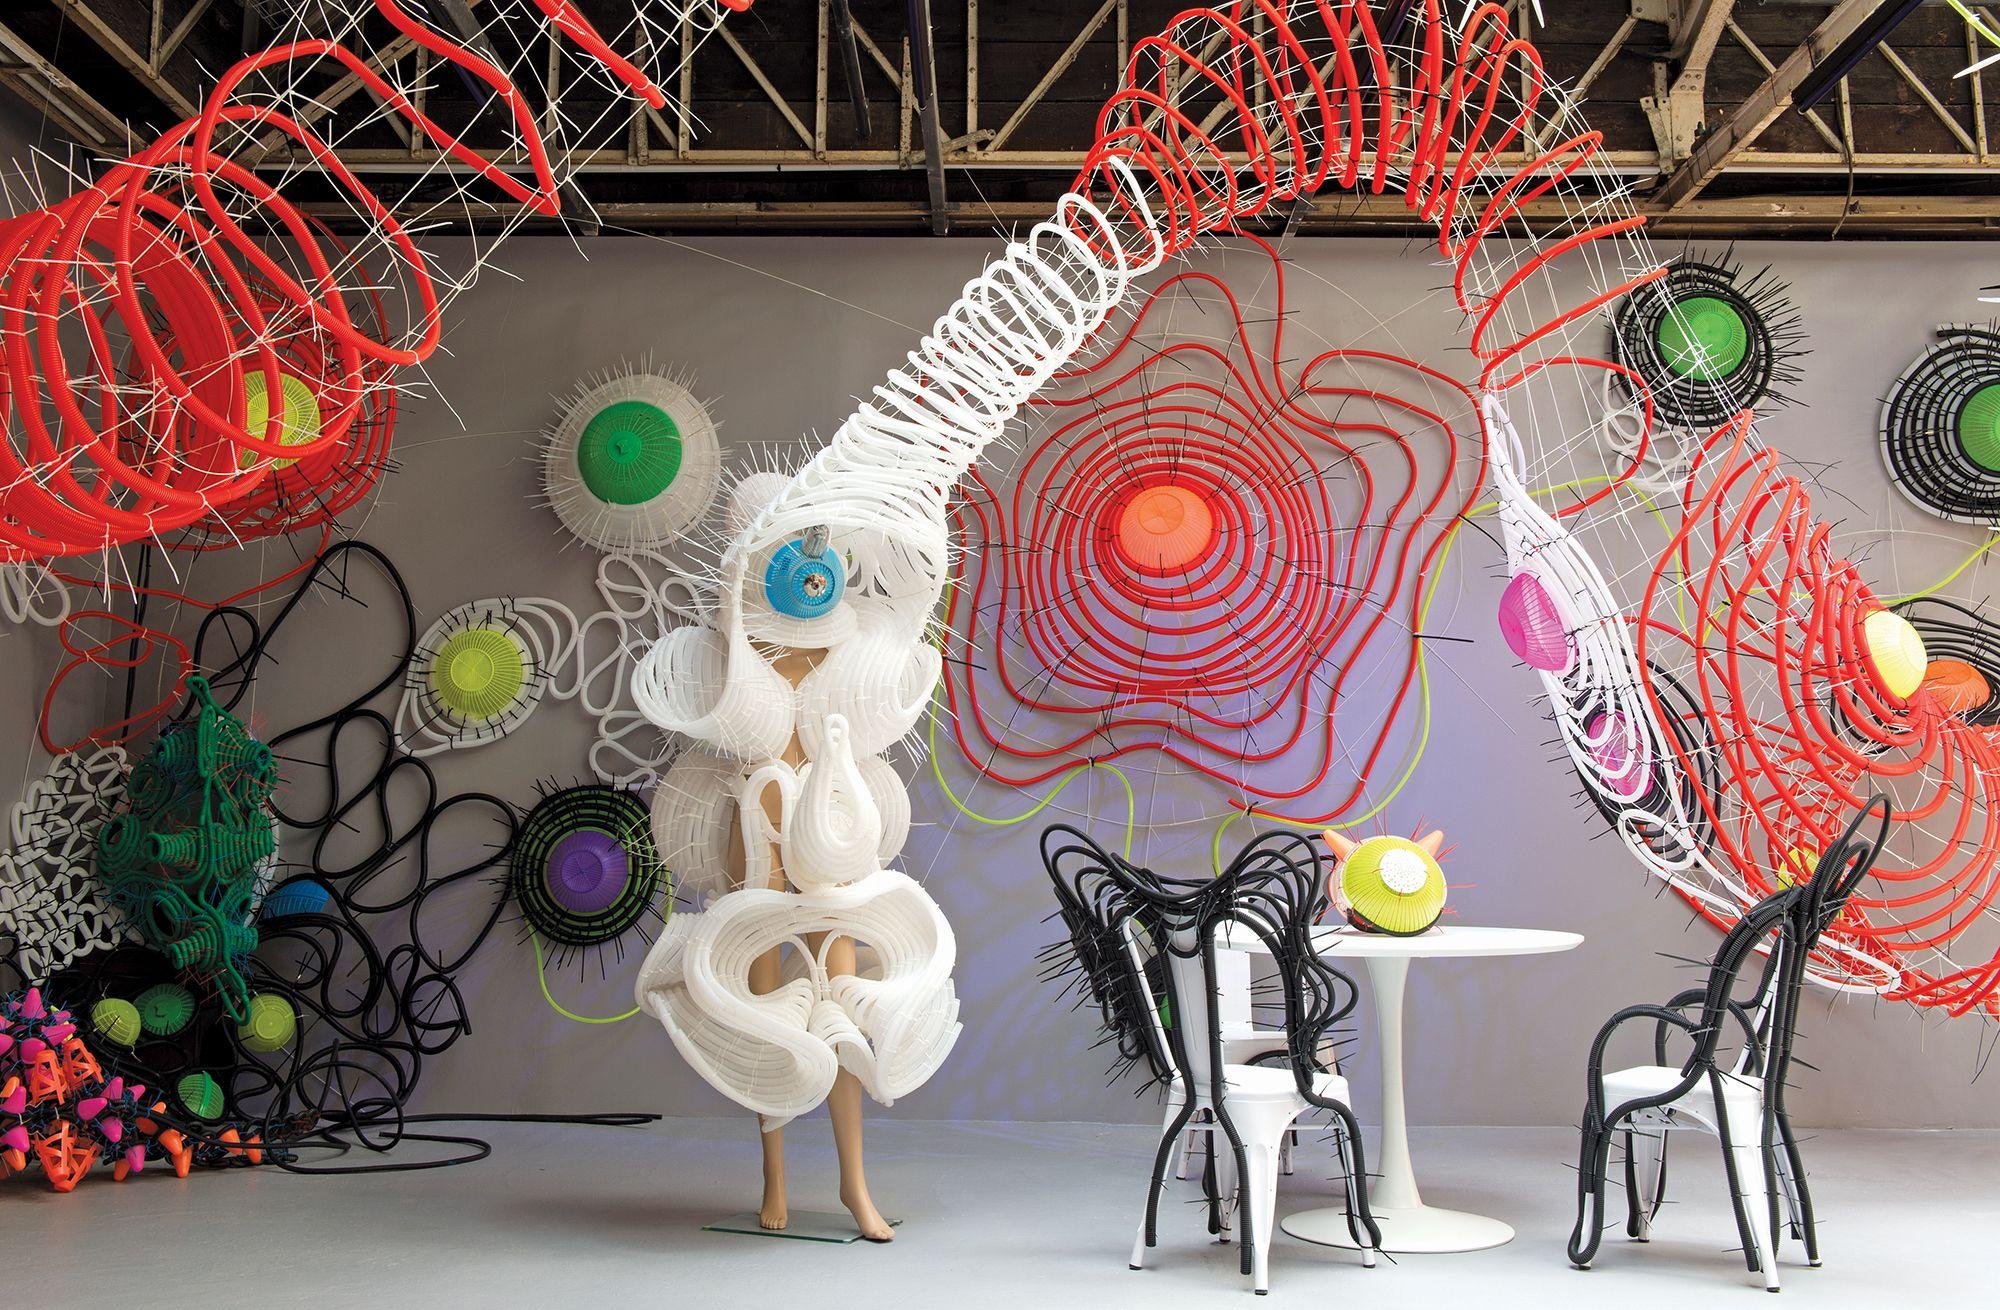 10 Filipino Artists Showcased Masterpieces in Paris at Palais de Tokyo's Summer Exhibition